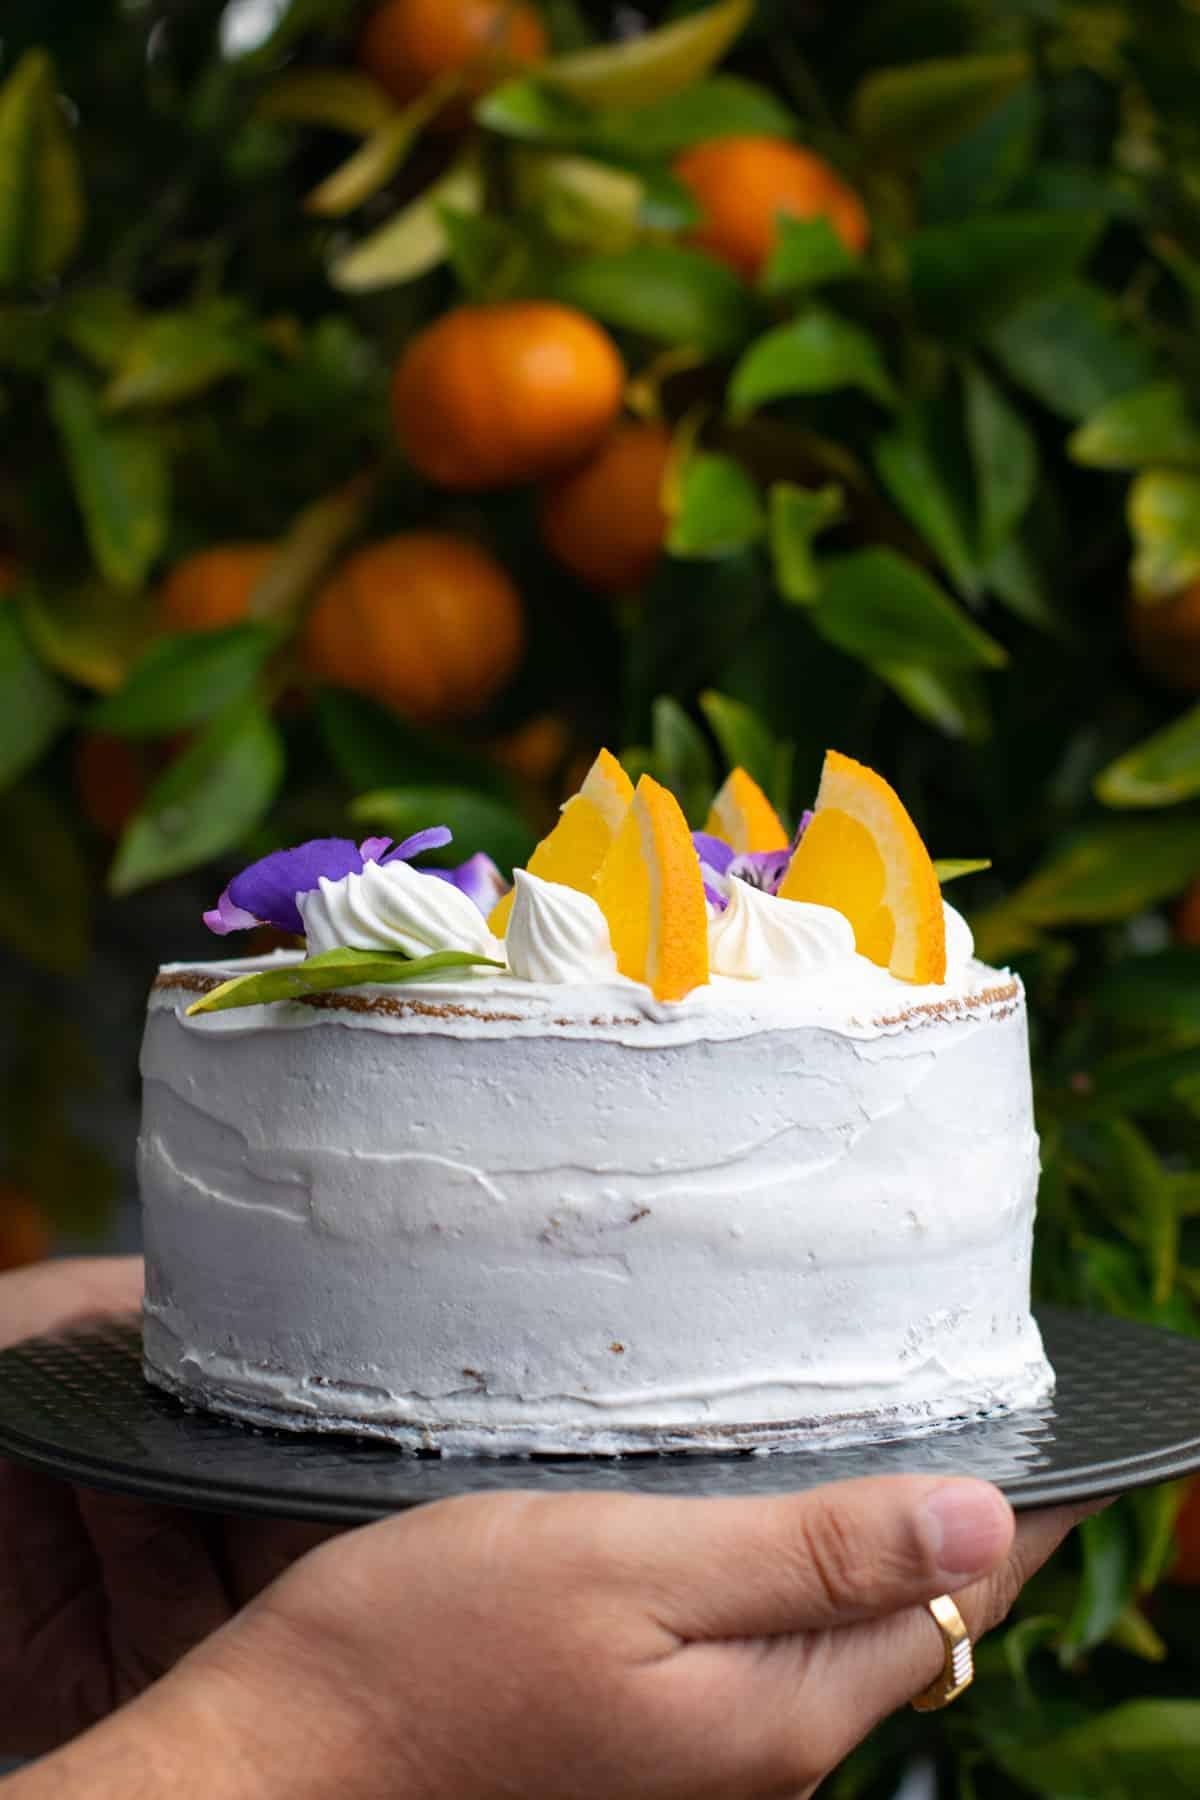 Holding the cake next to my orange tree